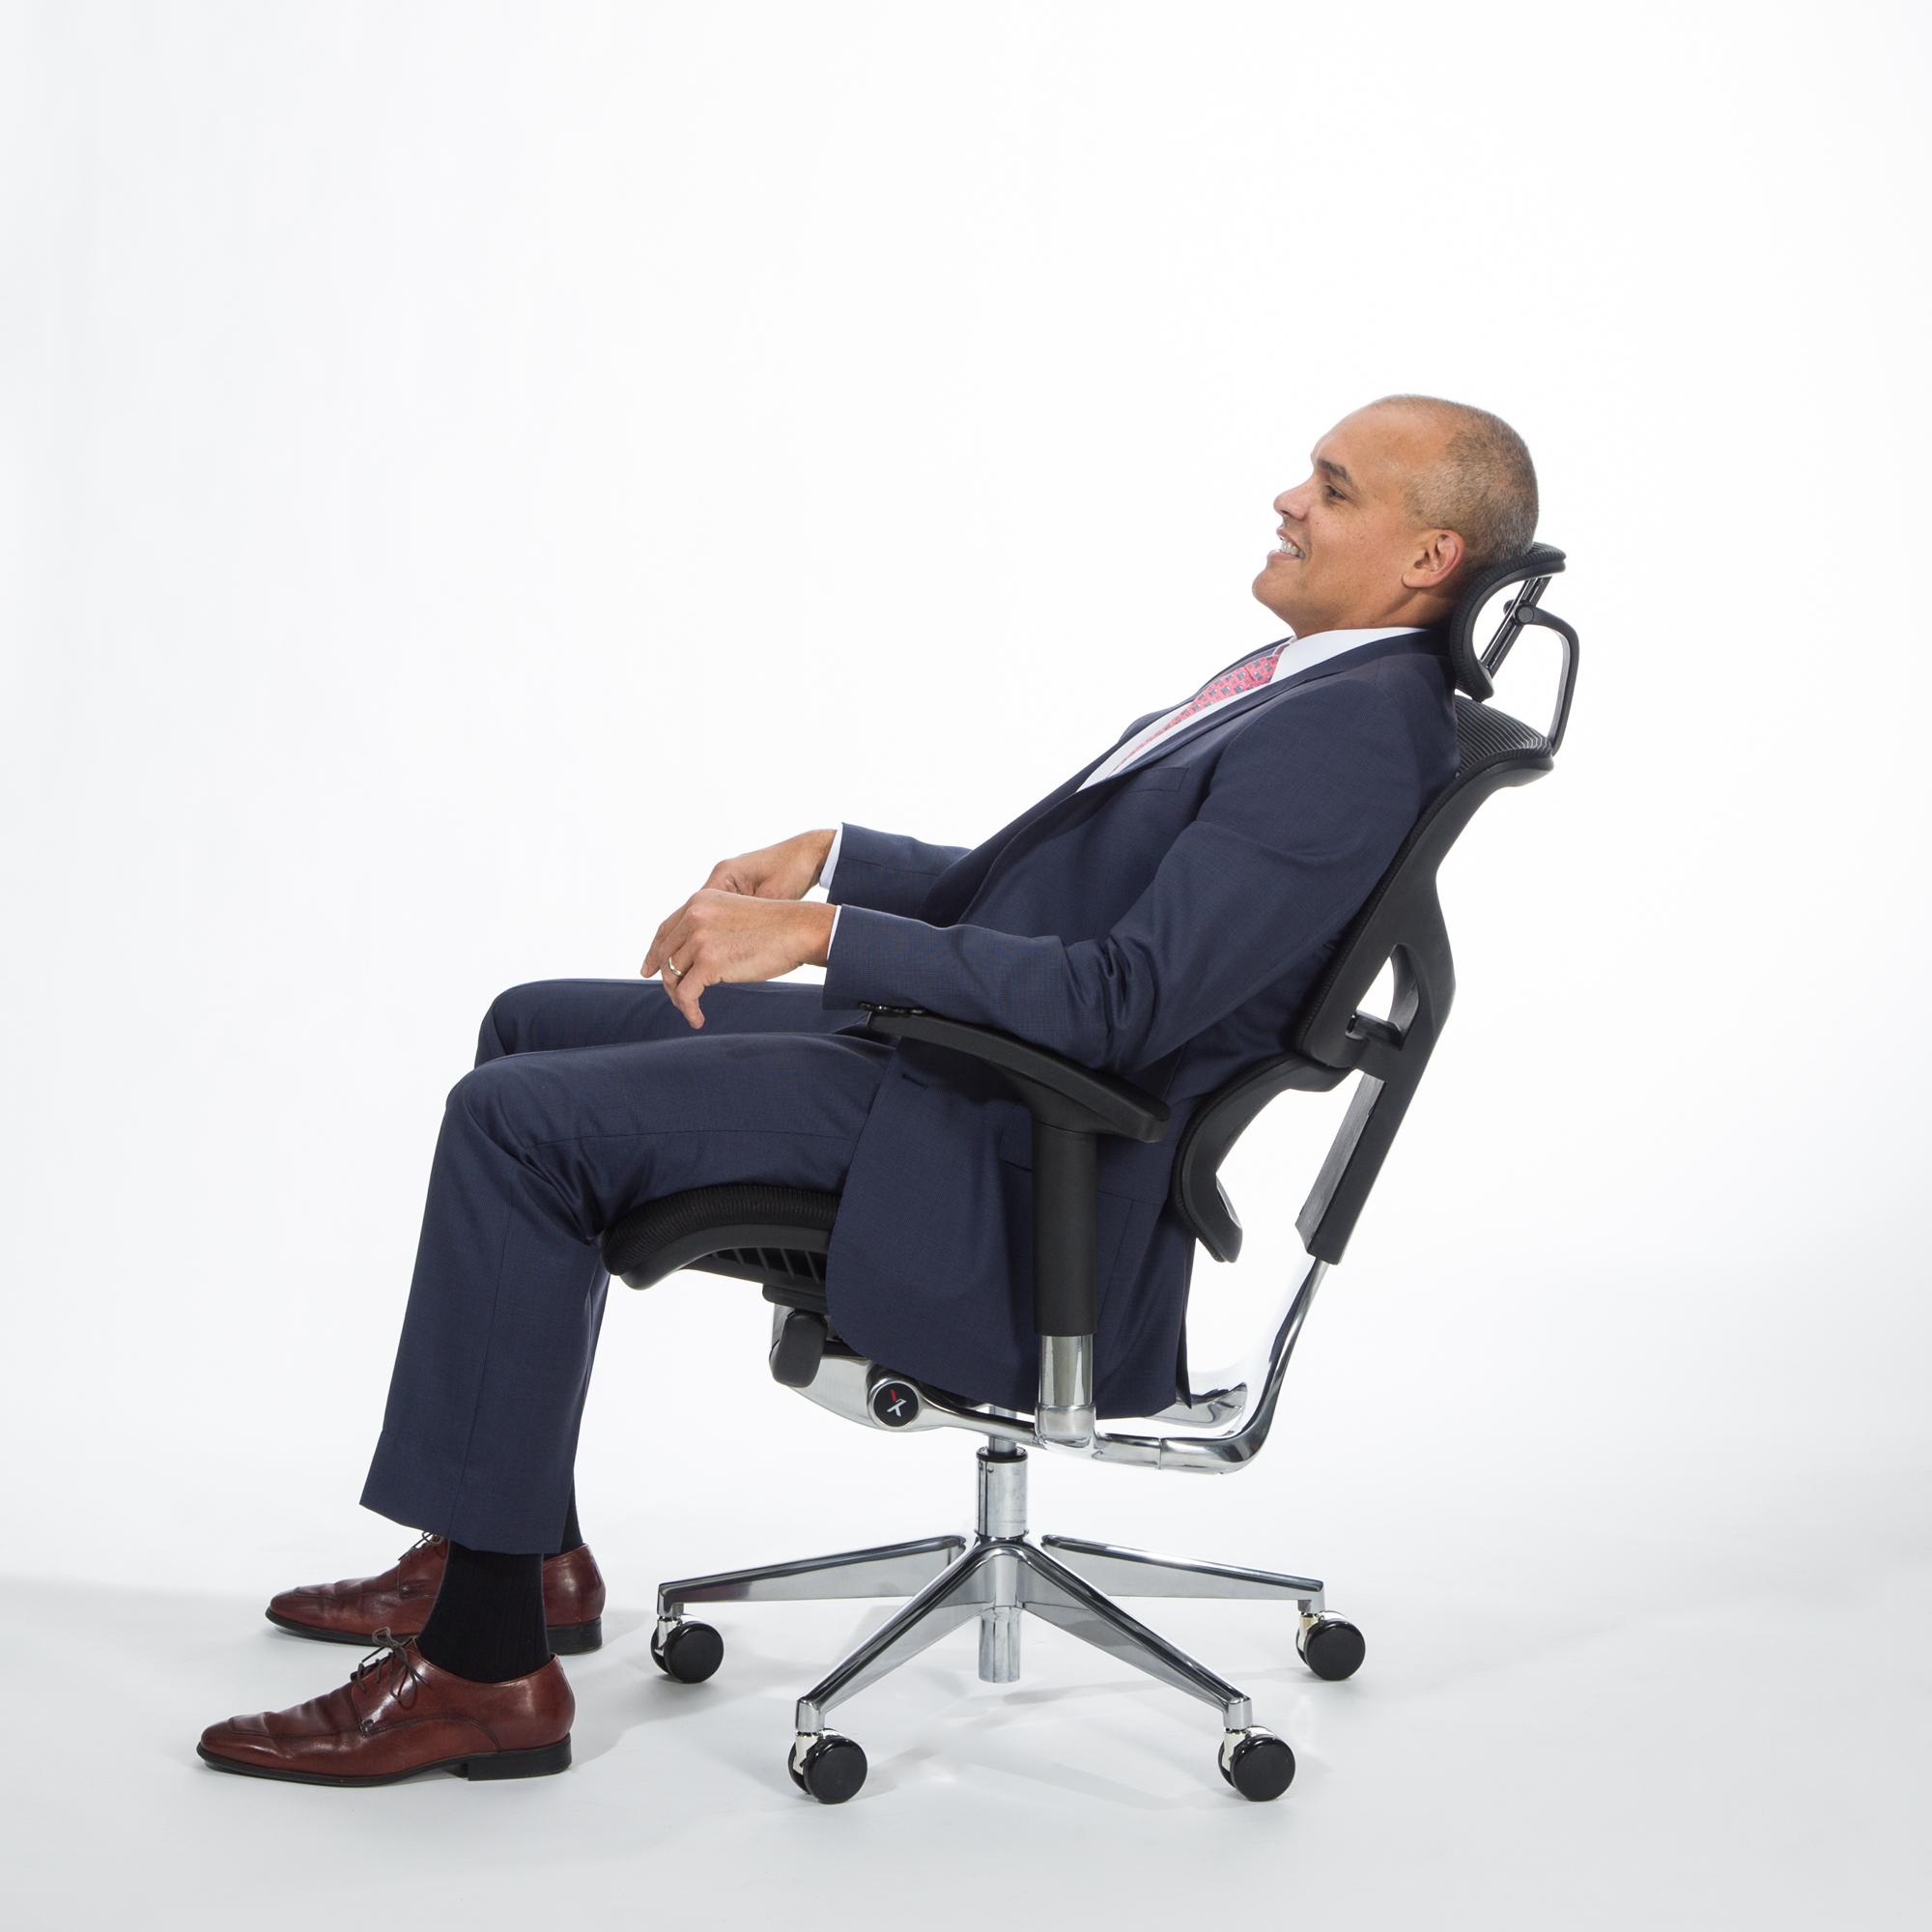 X Chair S Top 10 Home Office Tips During Quarantine Millennium Magazine